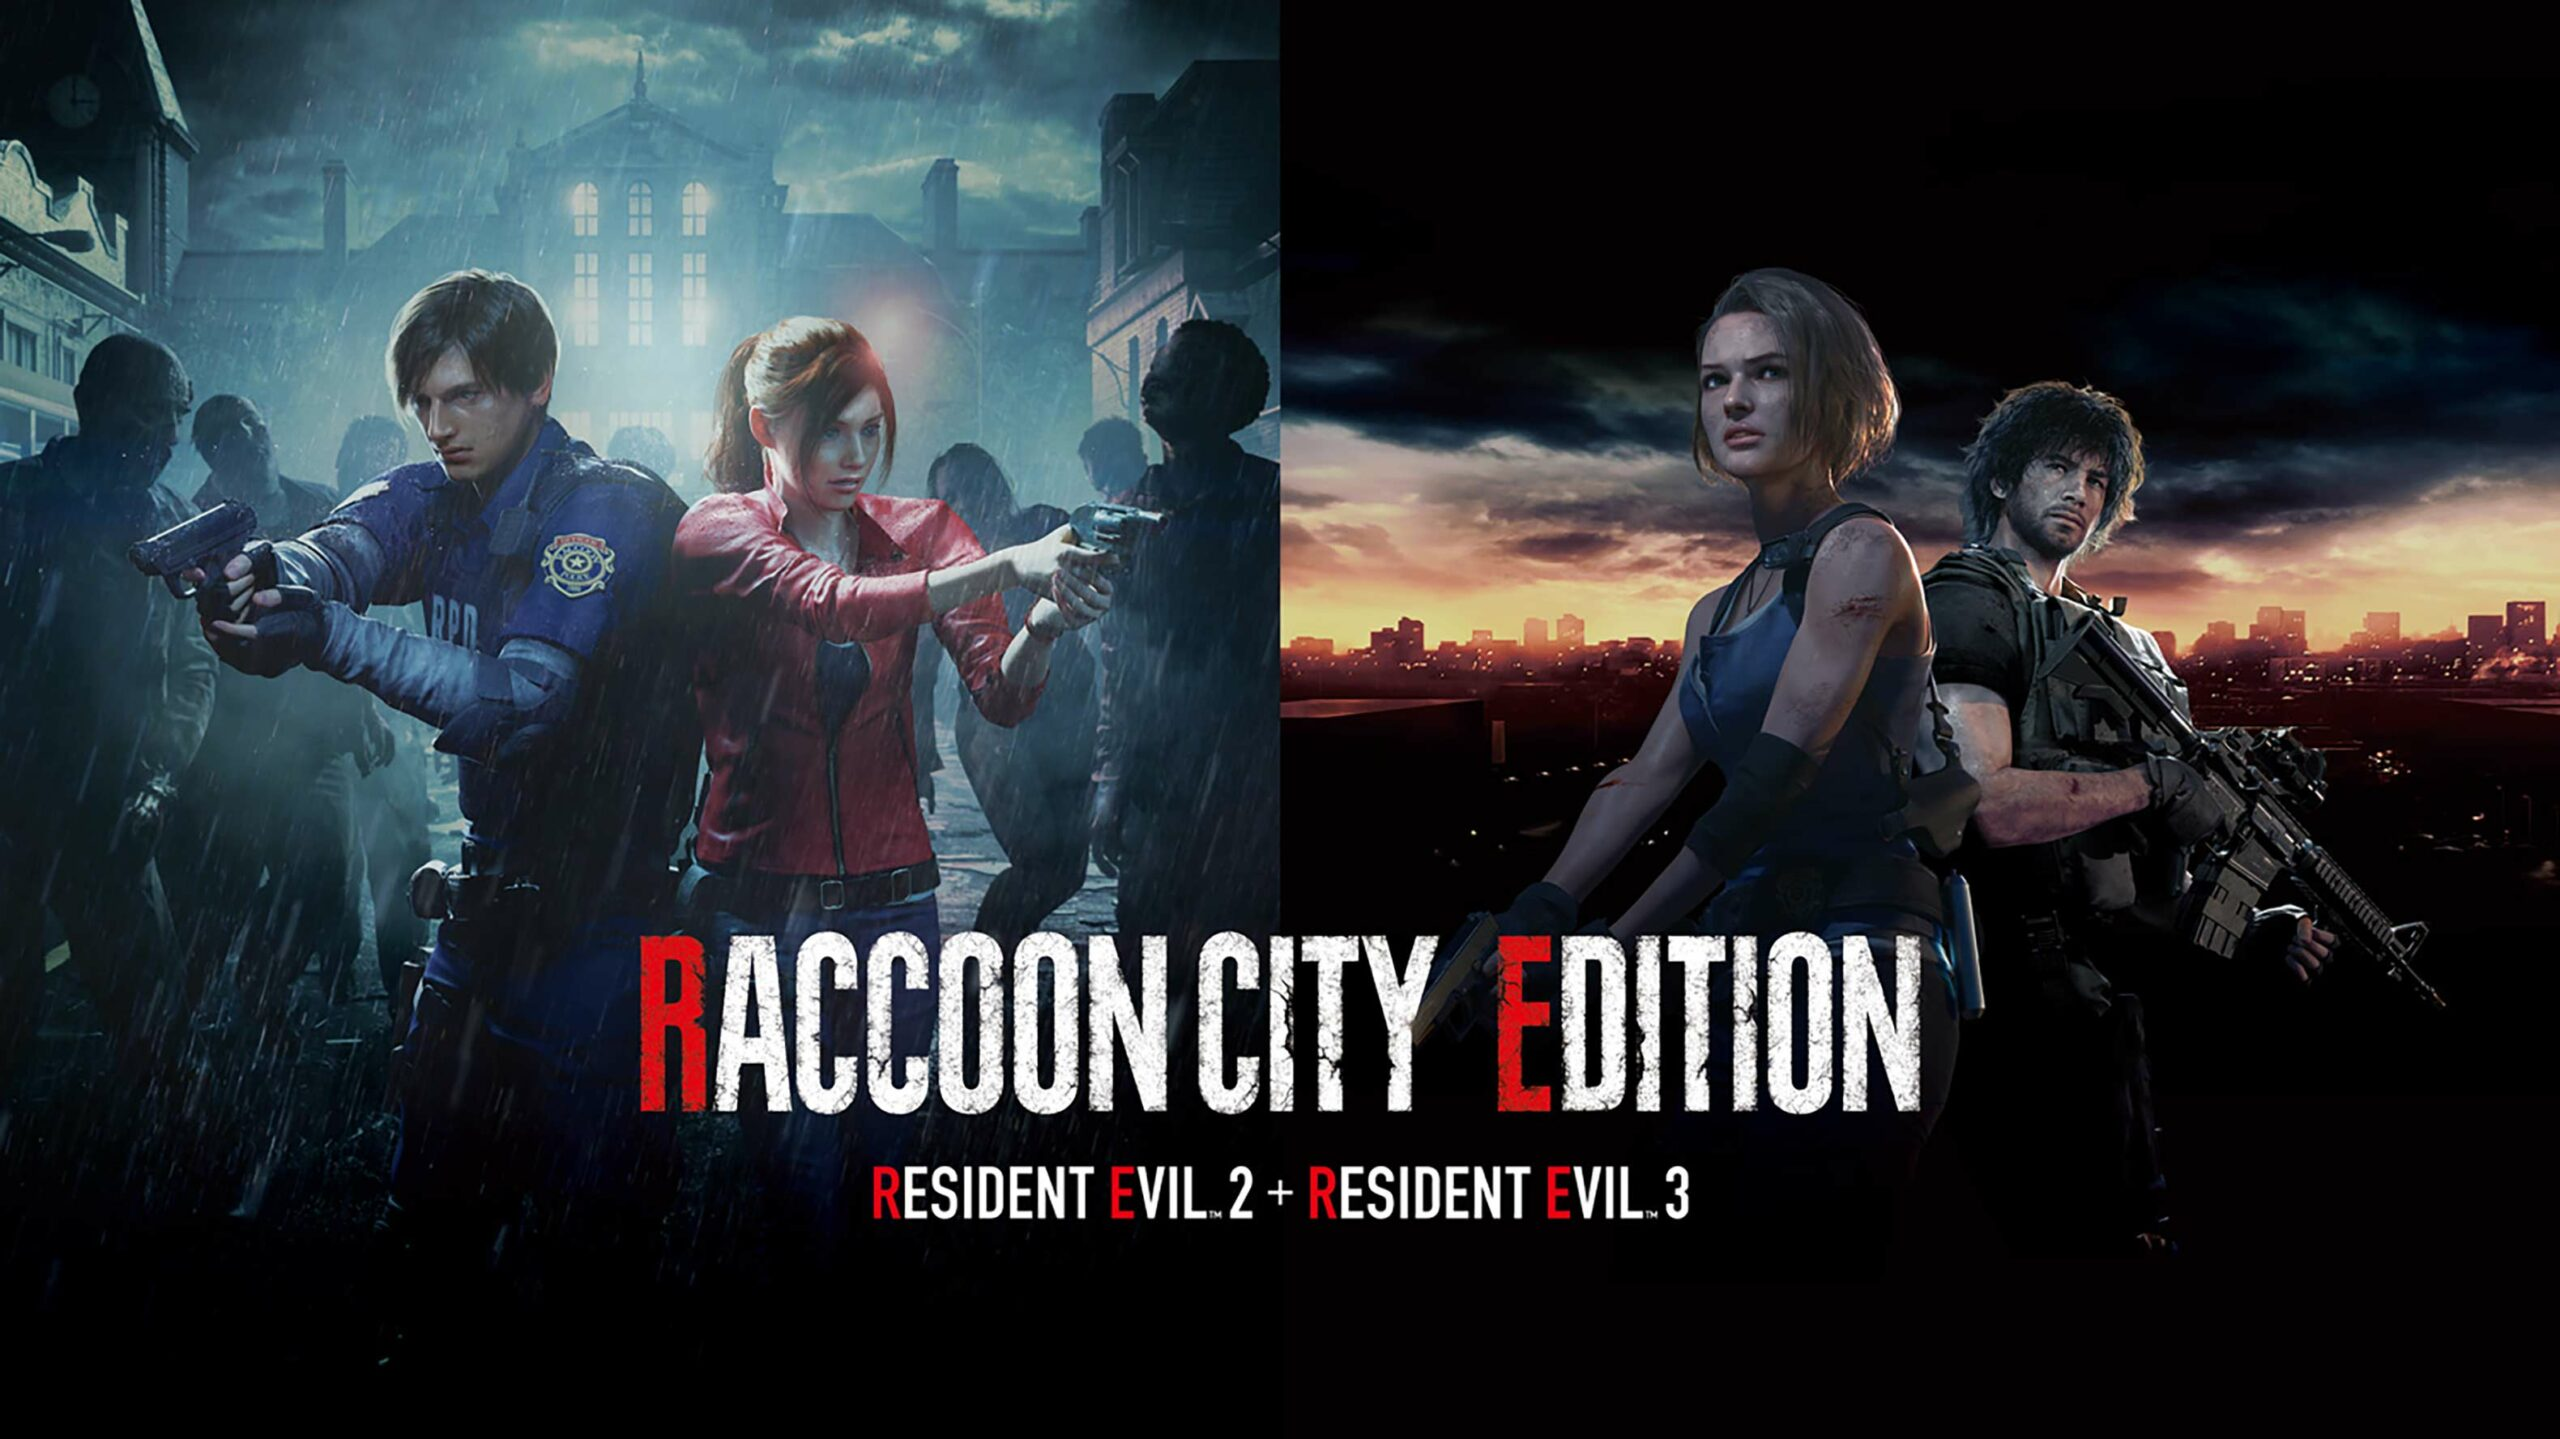 Resident Evil Raccoon City Edition